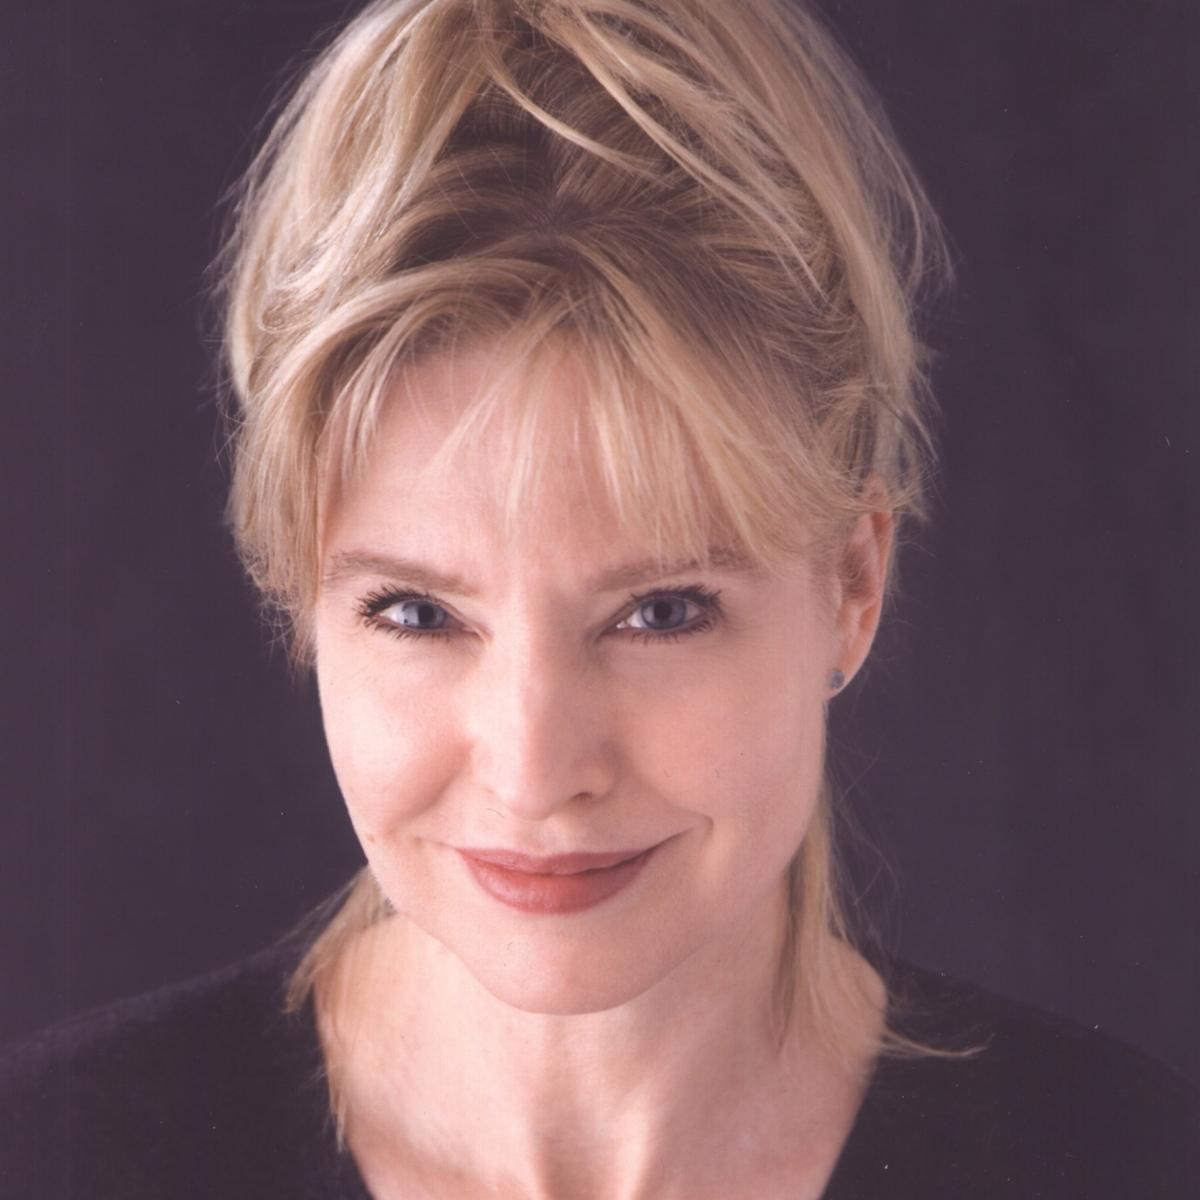 Ishan Morris,Jenna Elfman born September 30, 1971 (age 47) Adult clip Melody Anderson born December 3, 1955 (age 62),Brec Bassinger